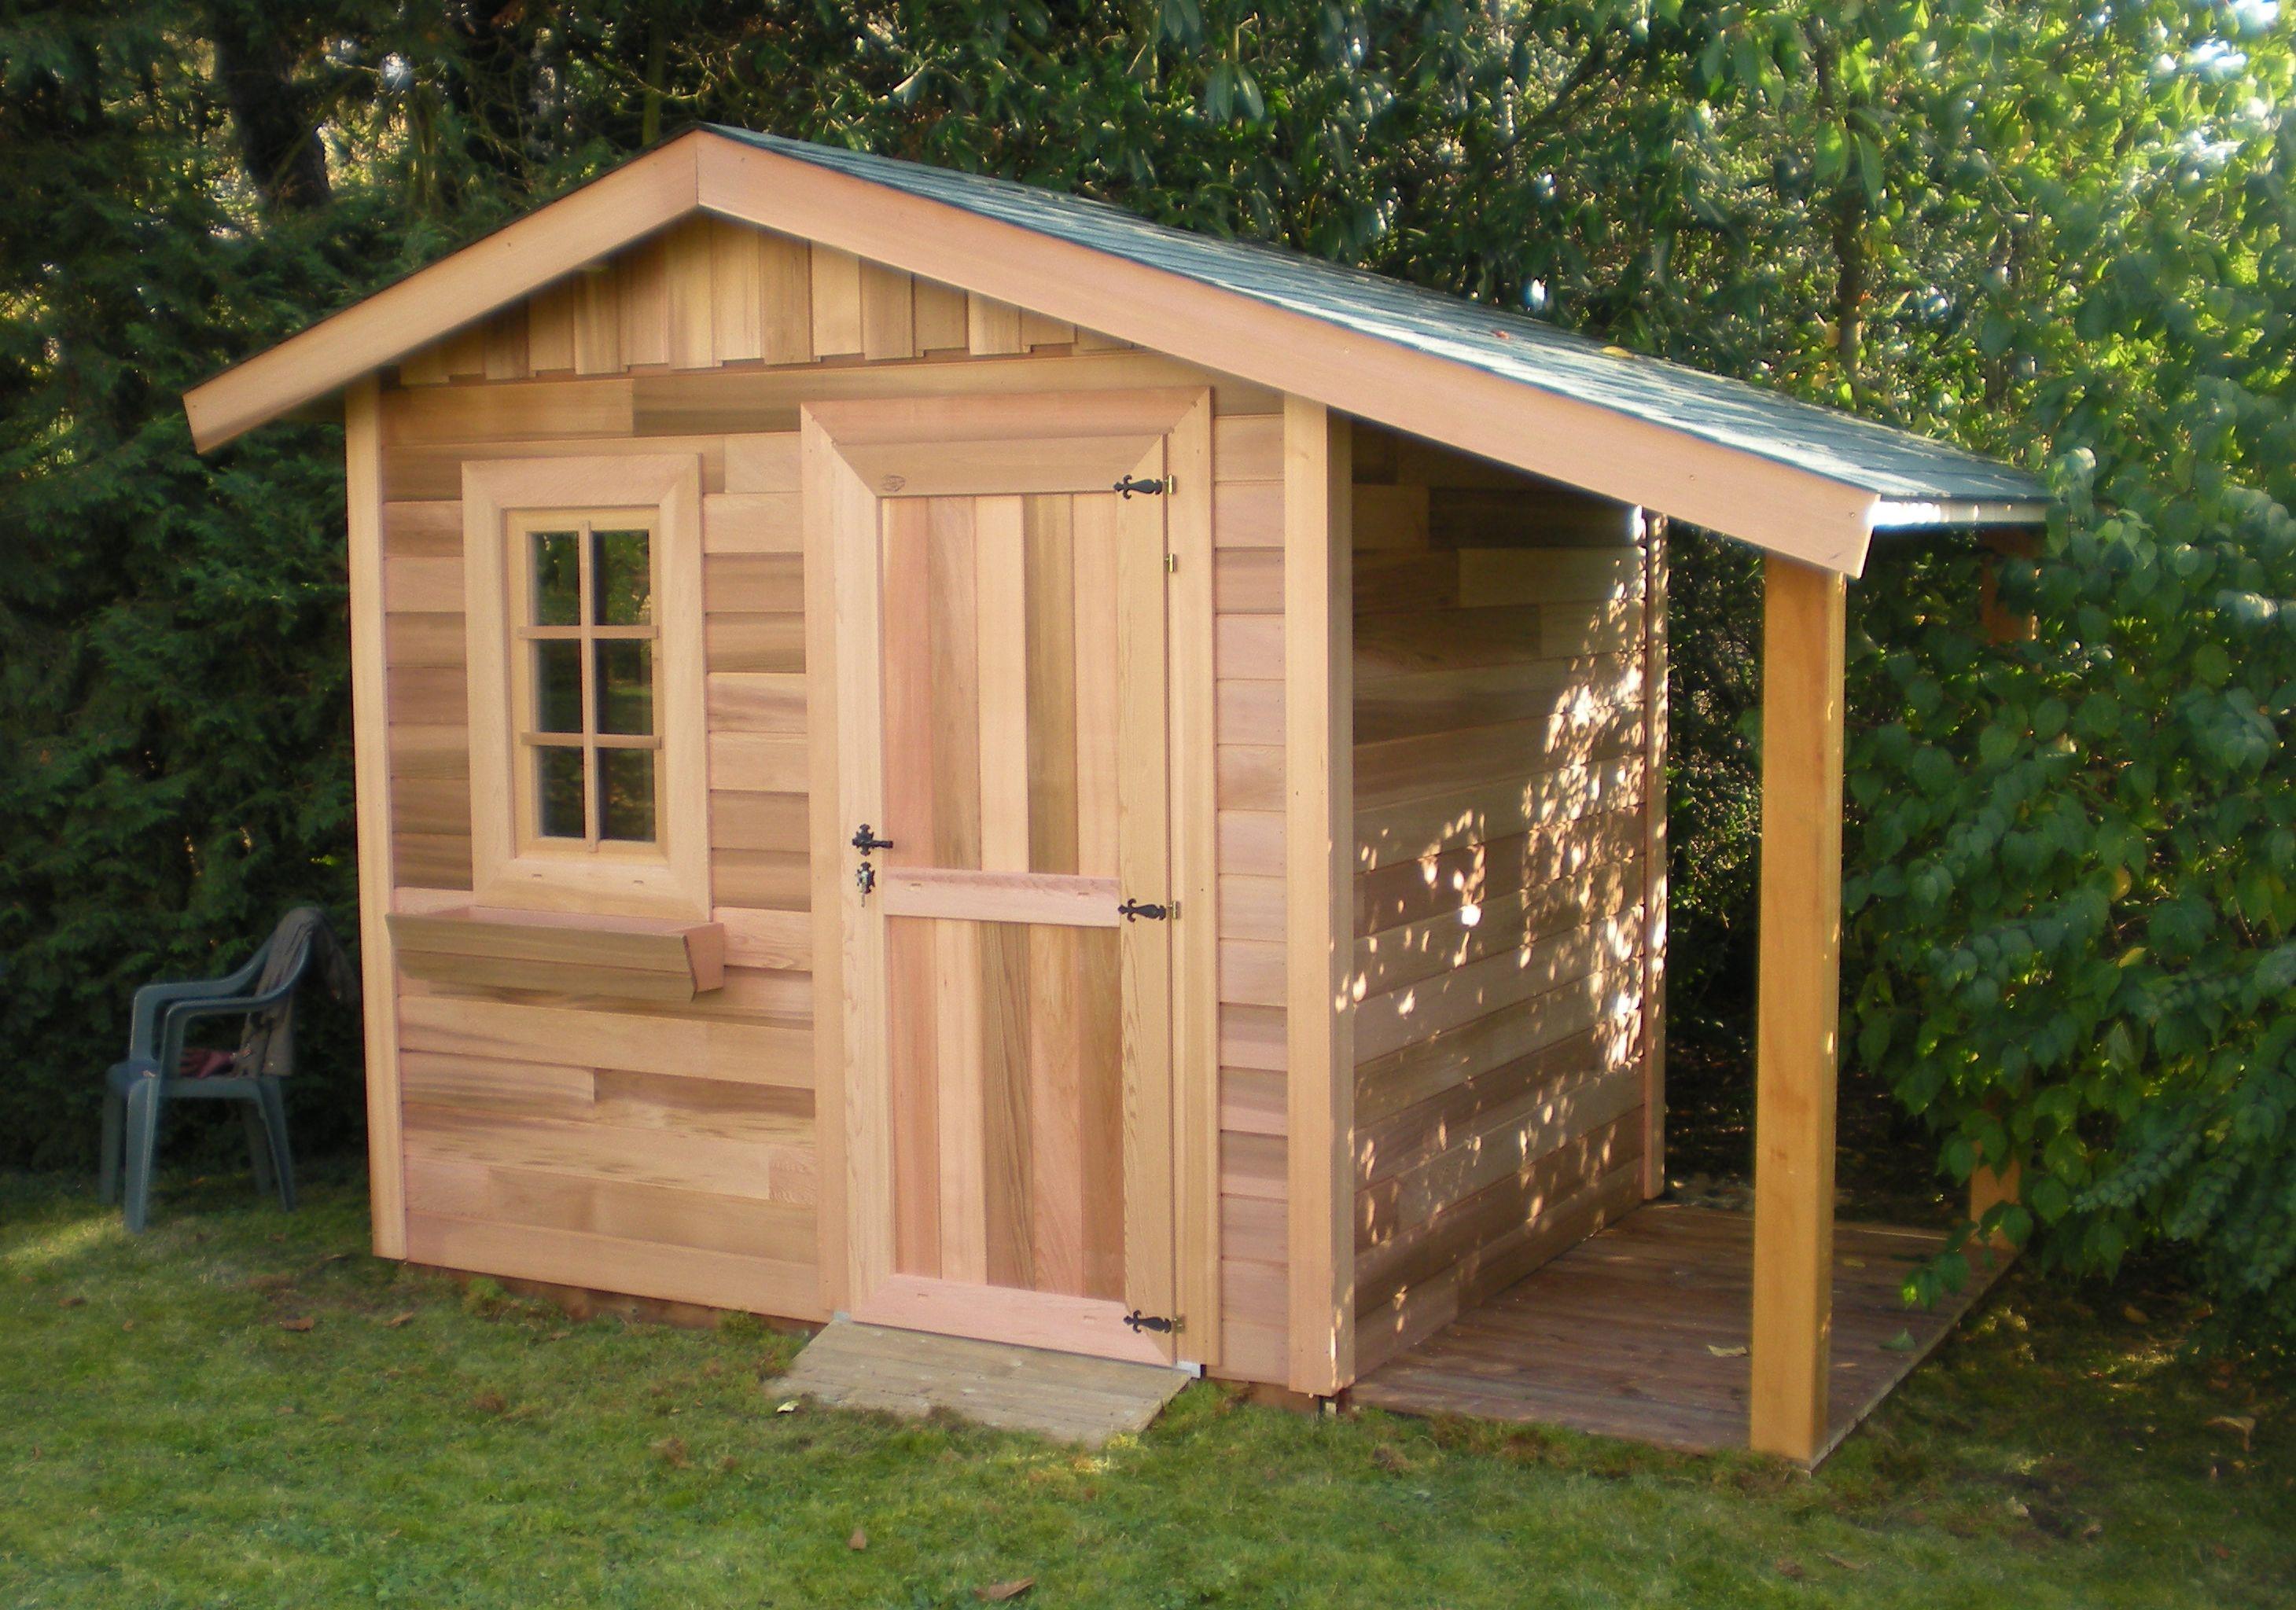 incroyable cabanon de jardin carrefour 4 carport bois brico - poulailler fd2436a16c2f